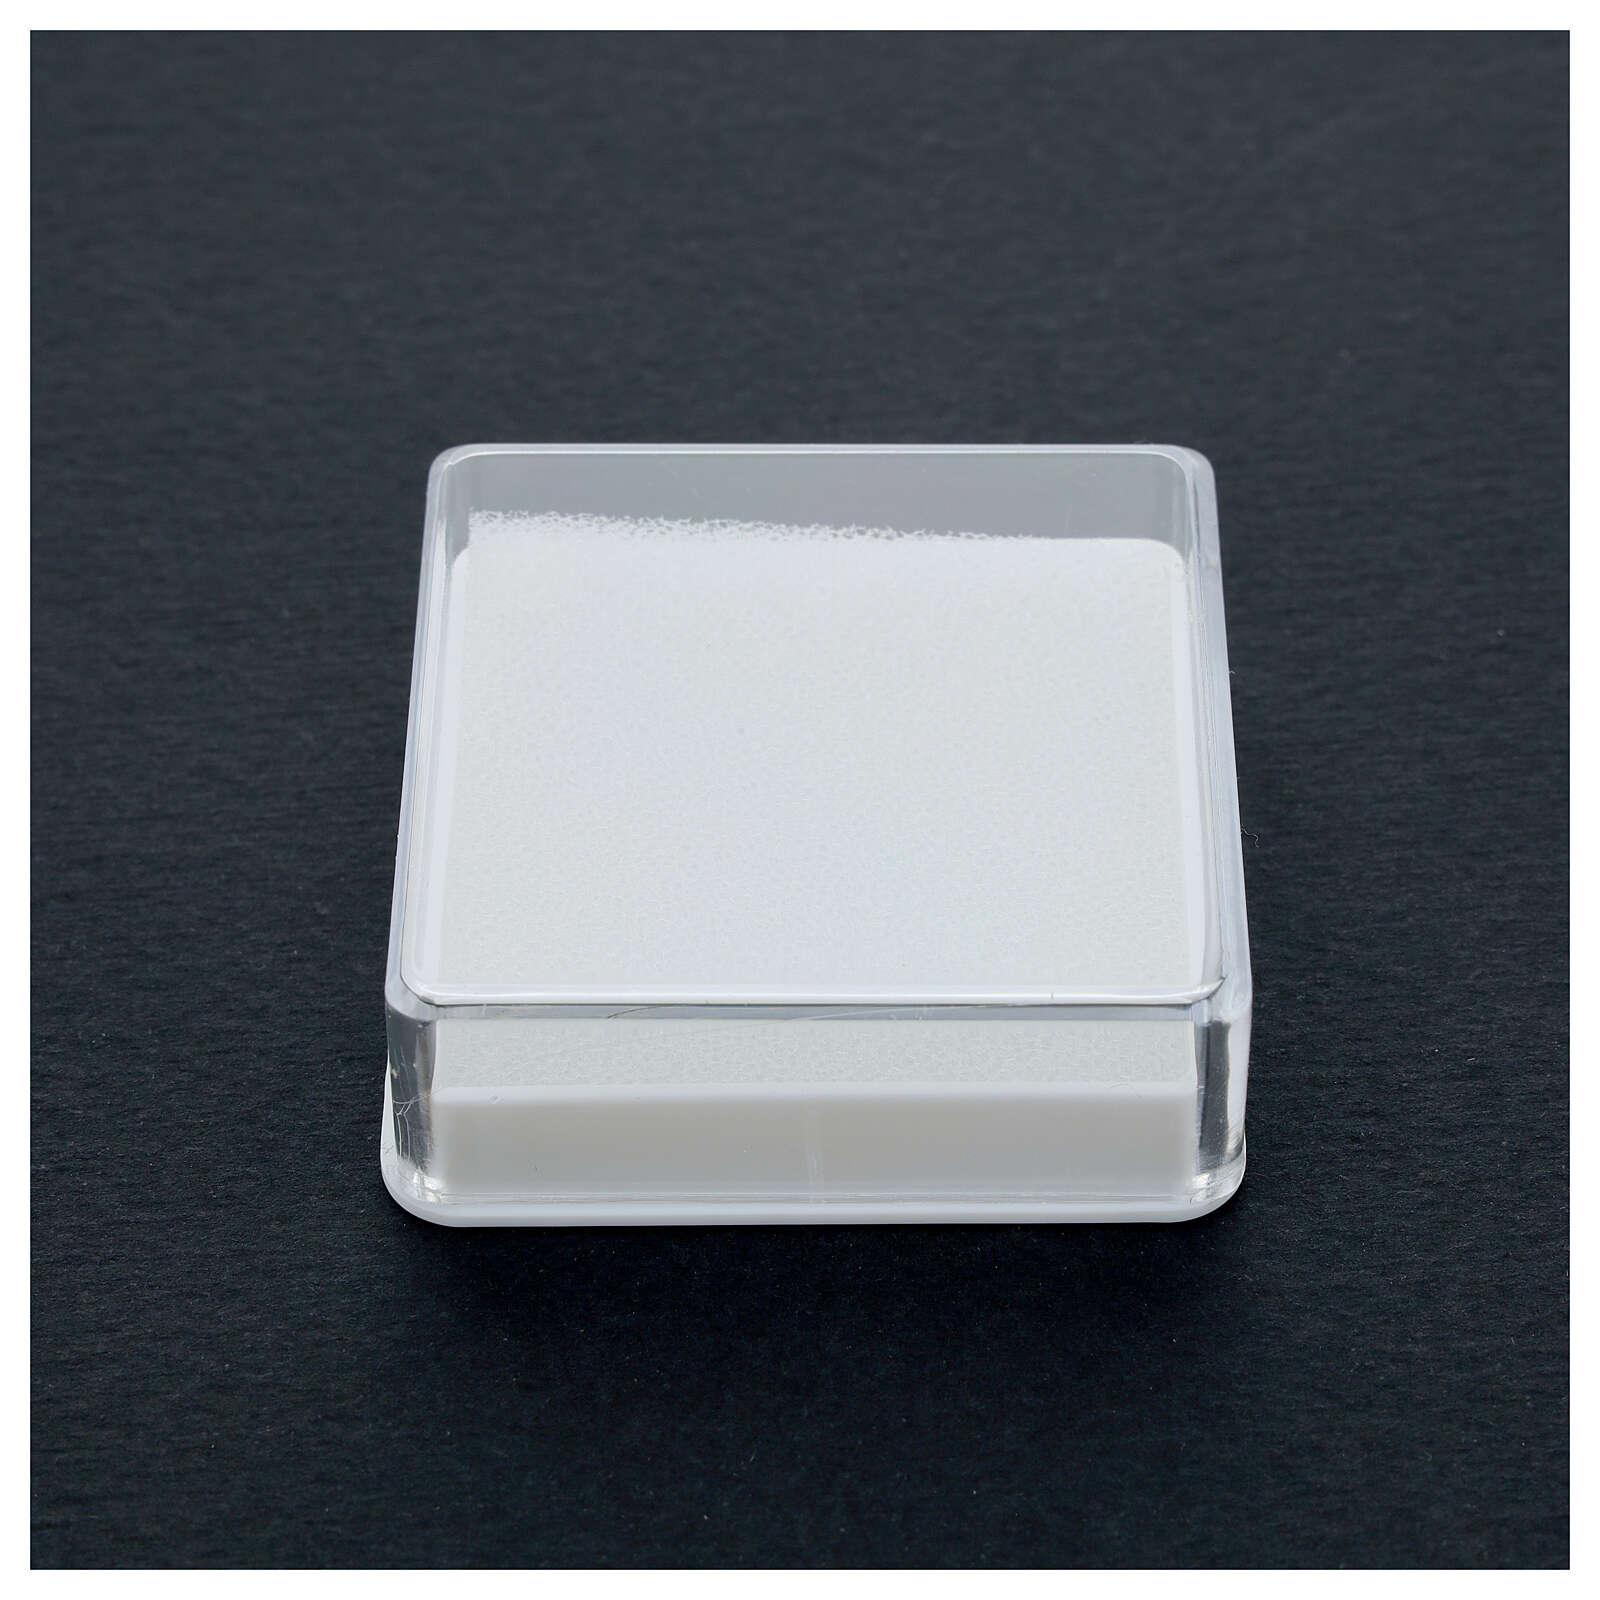 Scatola portarosario quadrata 4